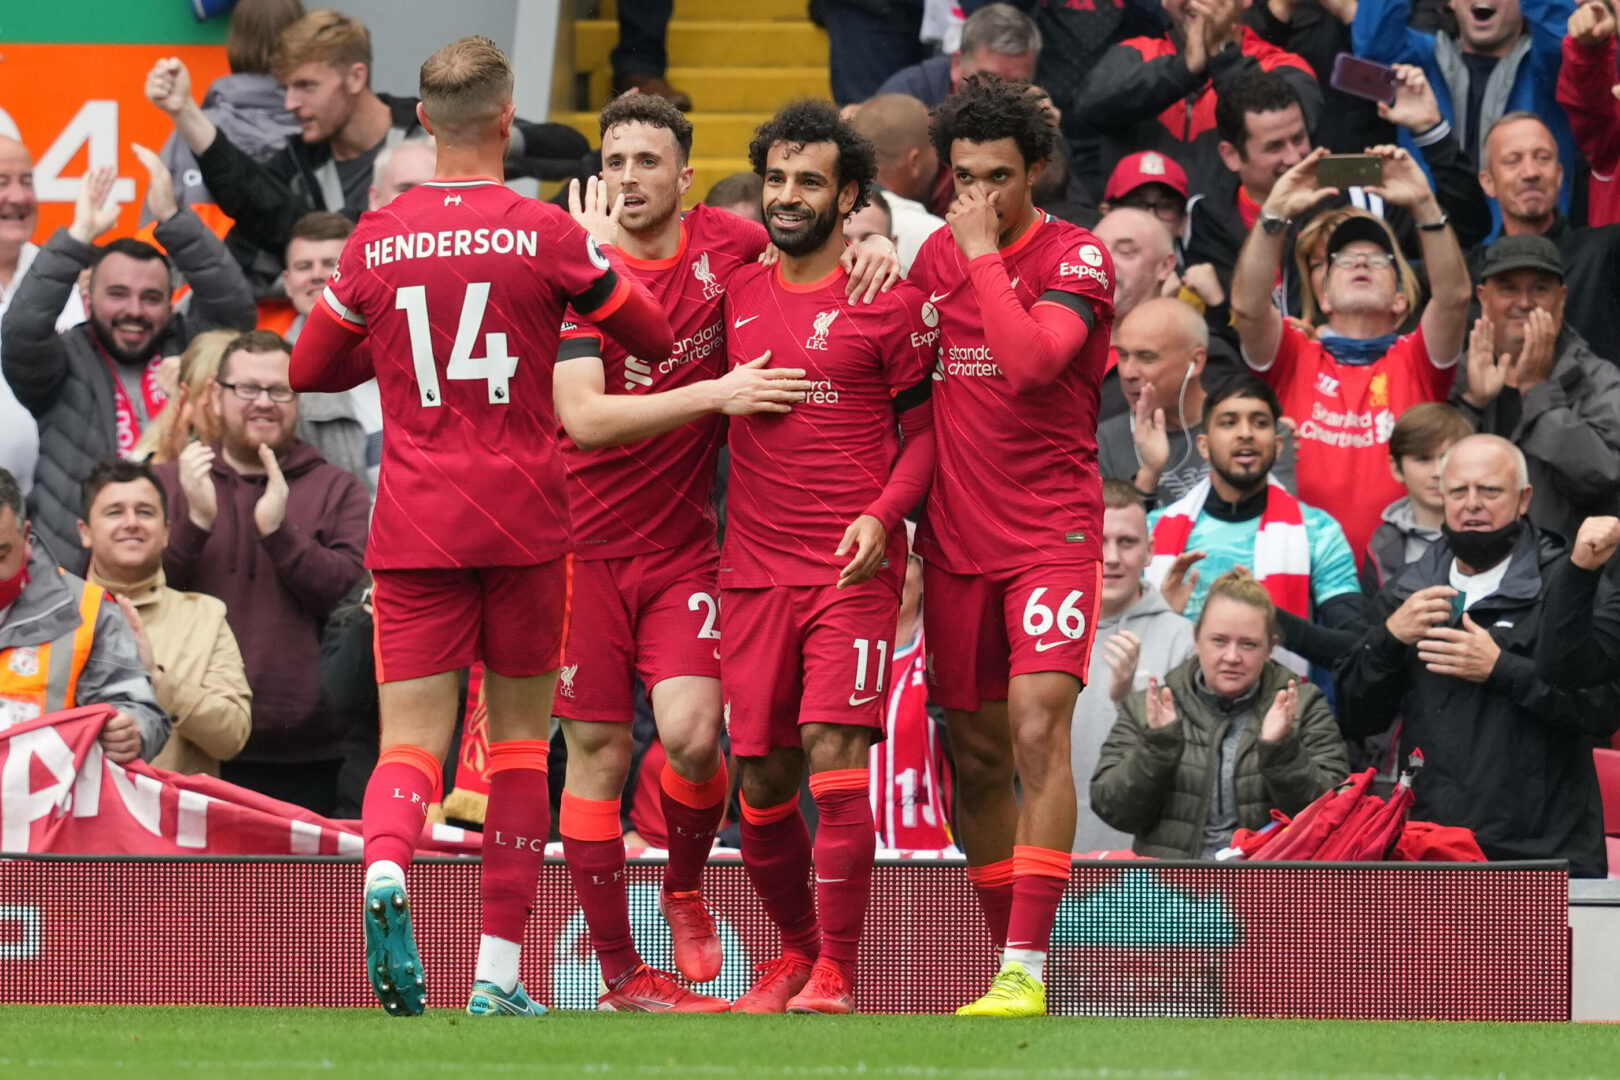 Liverpool besiegt Burnley im ausverkauften Anfield Stadium